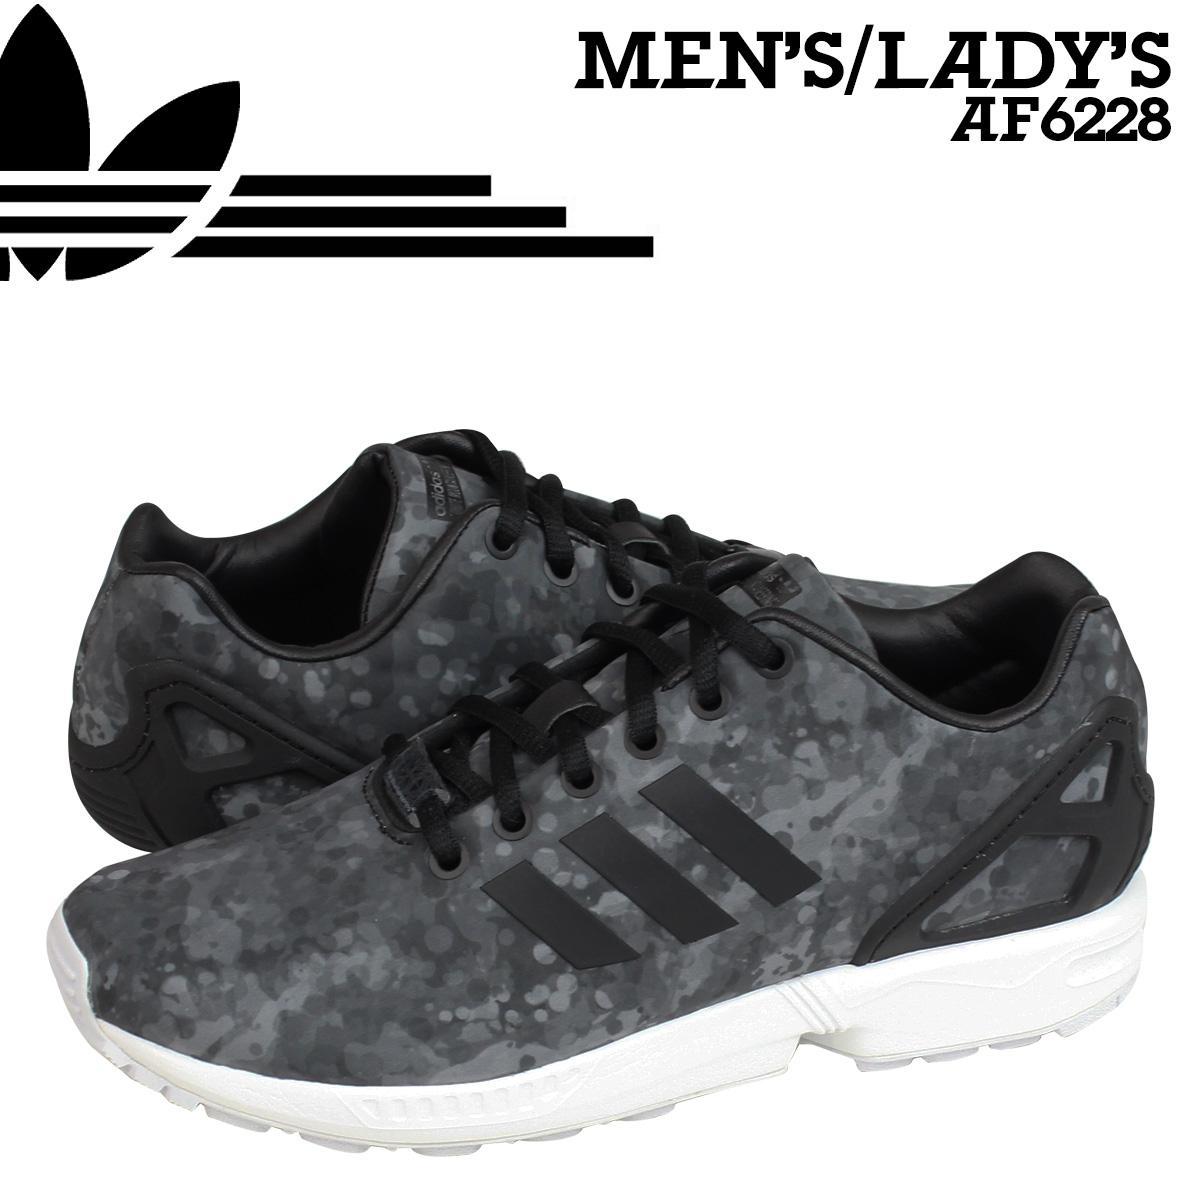 best loved 412d4 53e79 adidas CONSORTIUM Adidas consortium ZX FLUX sneakers ZX FLUX sneakers  collaboration AF6228 men gap Dis shoes black